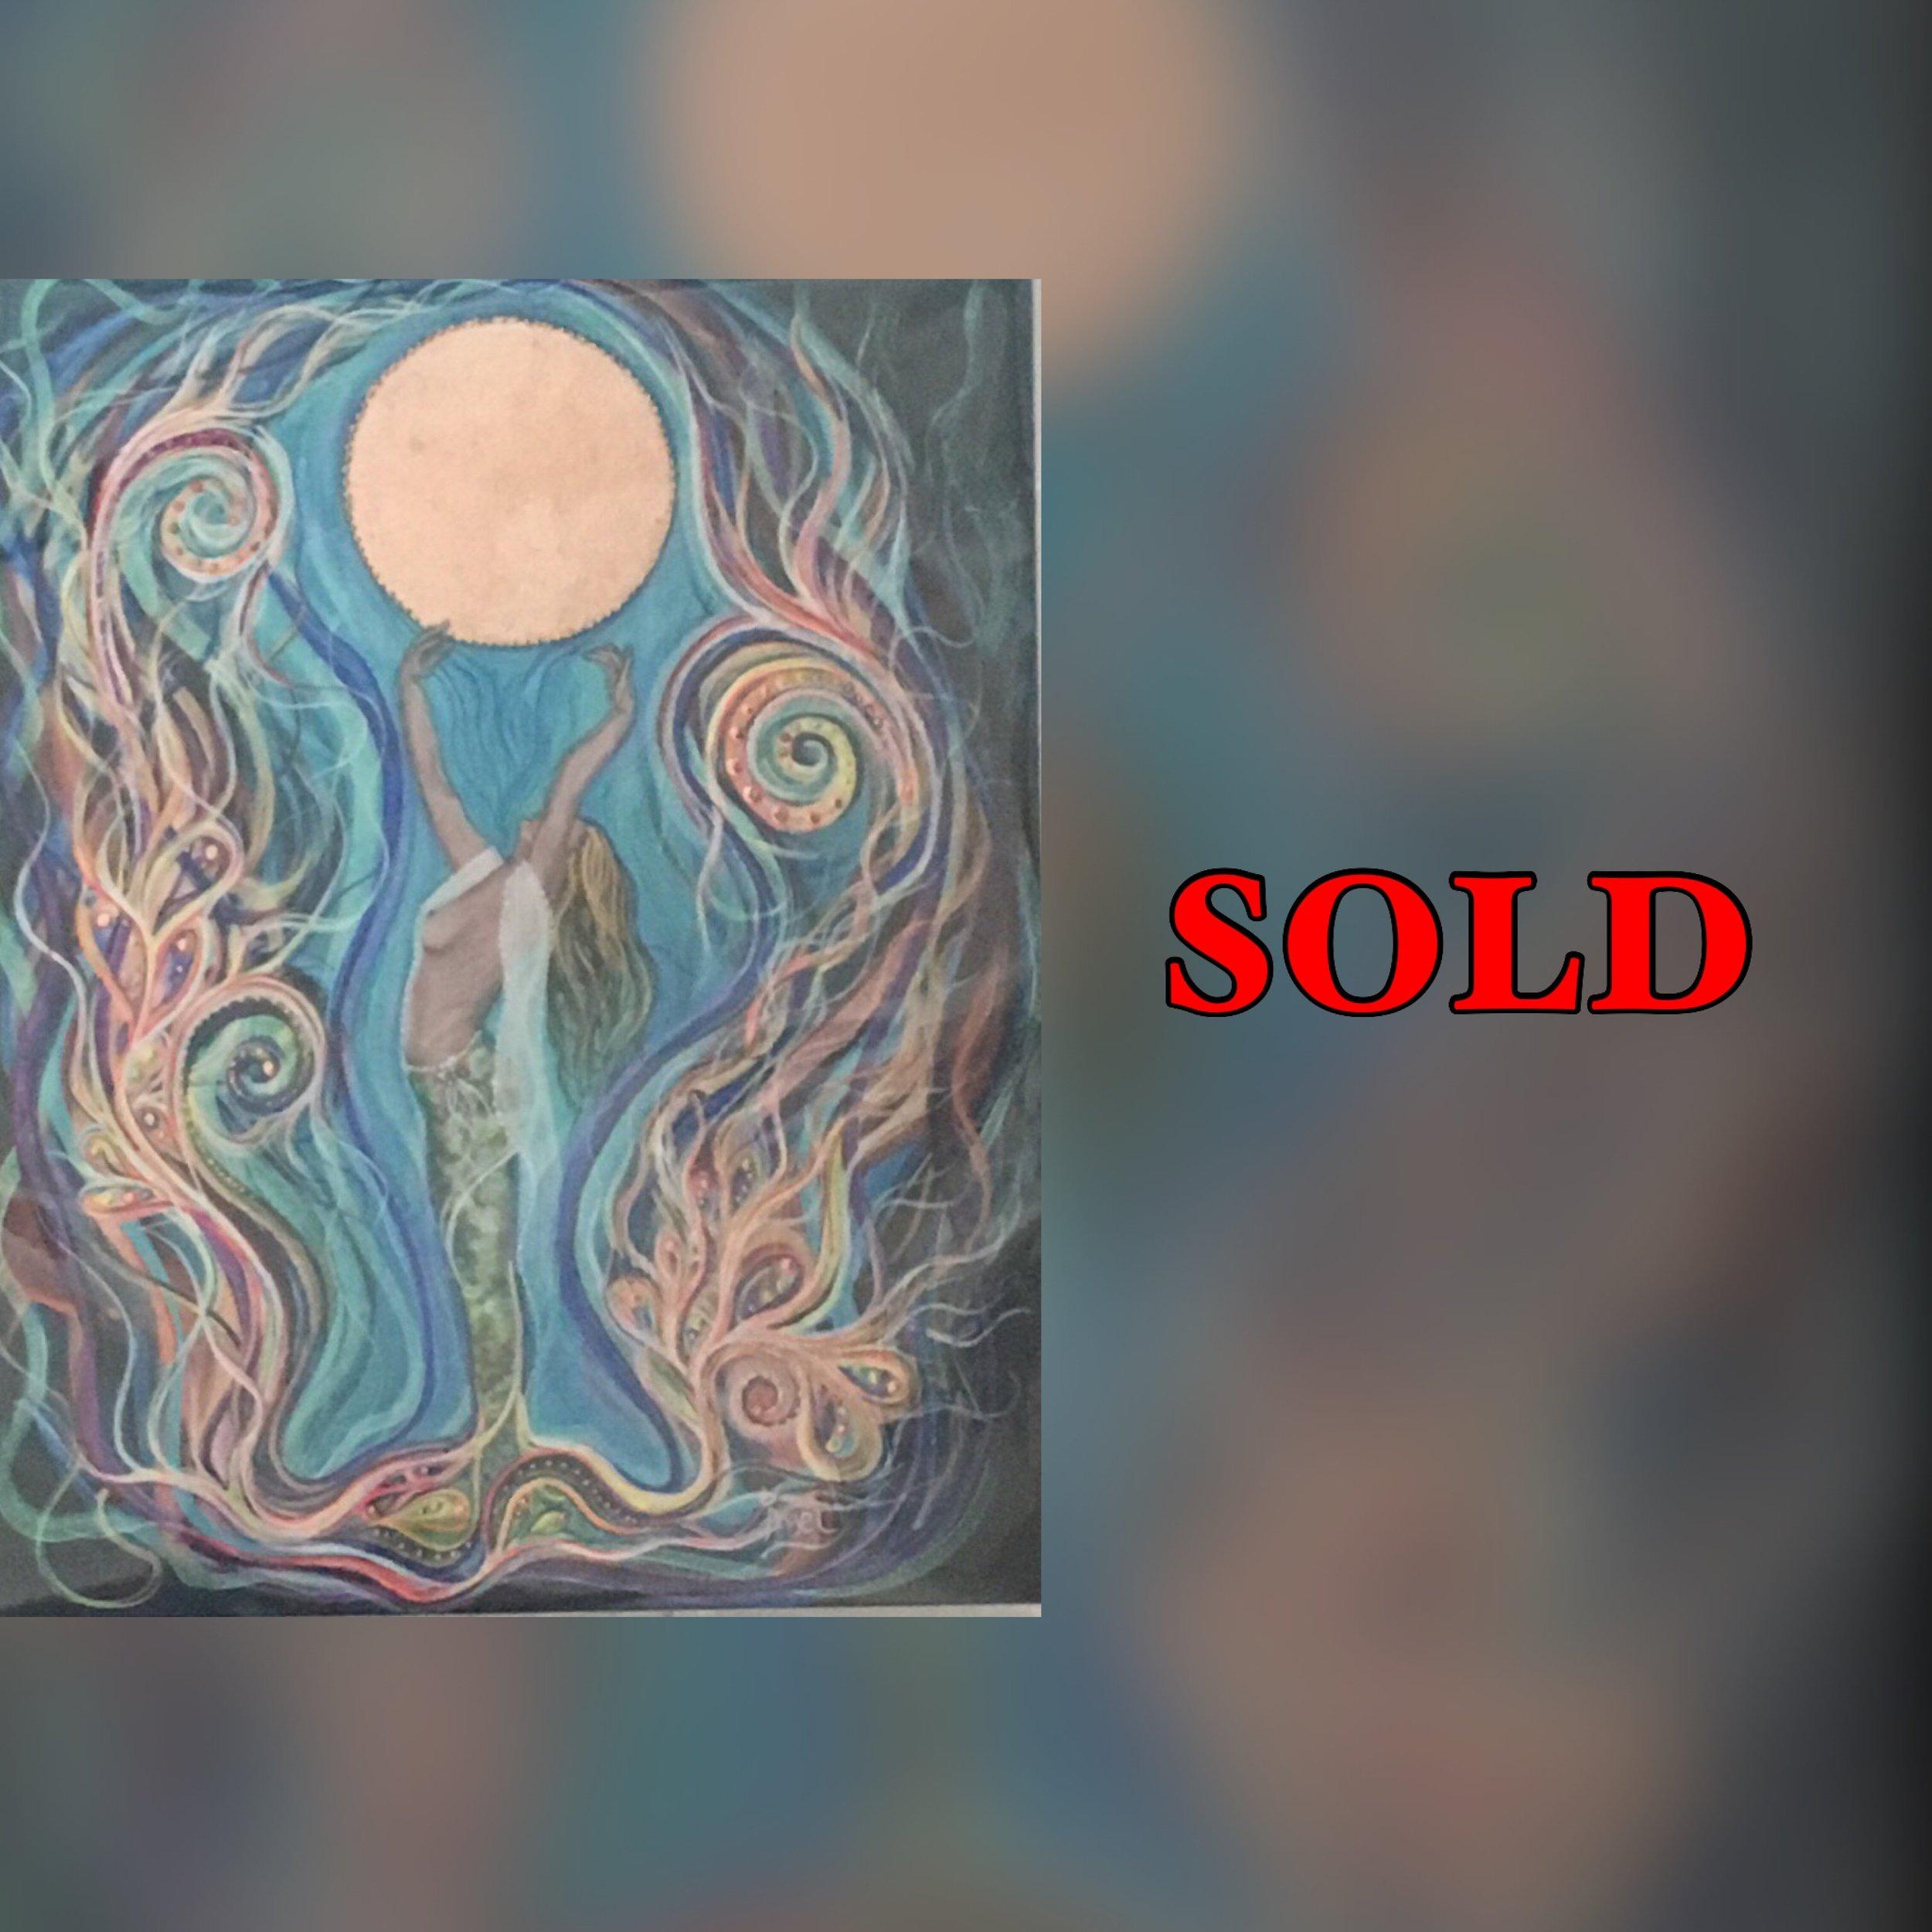 Moon Dance Print Sold.jpg